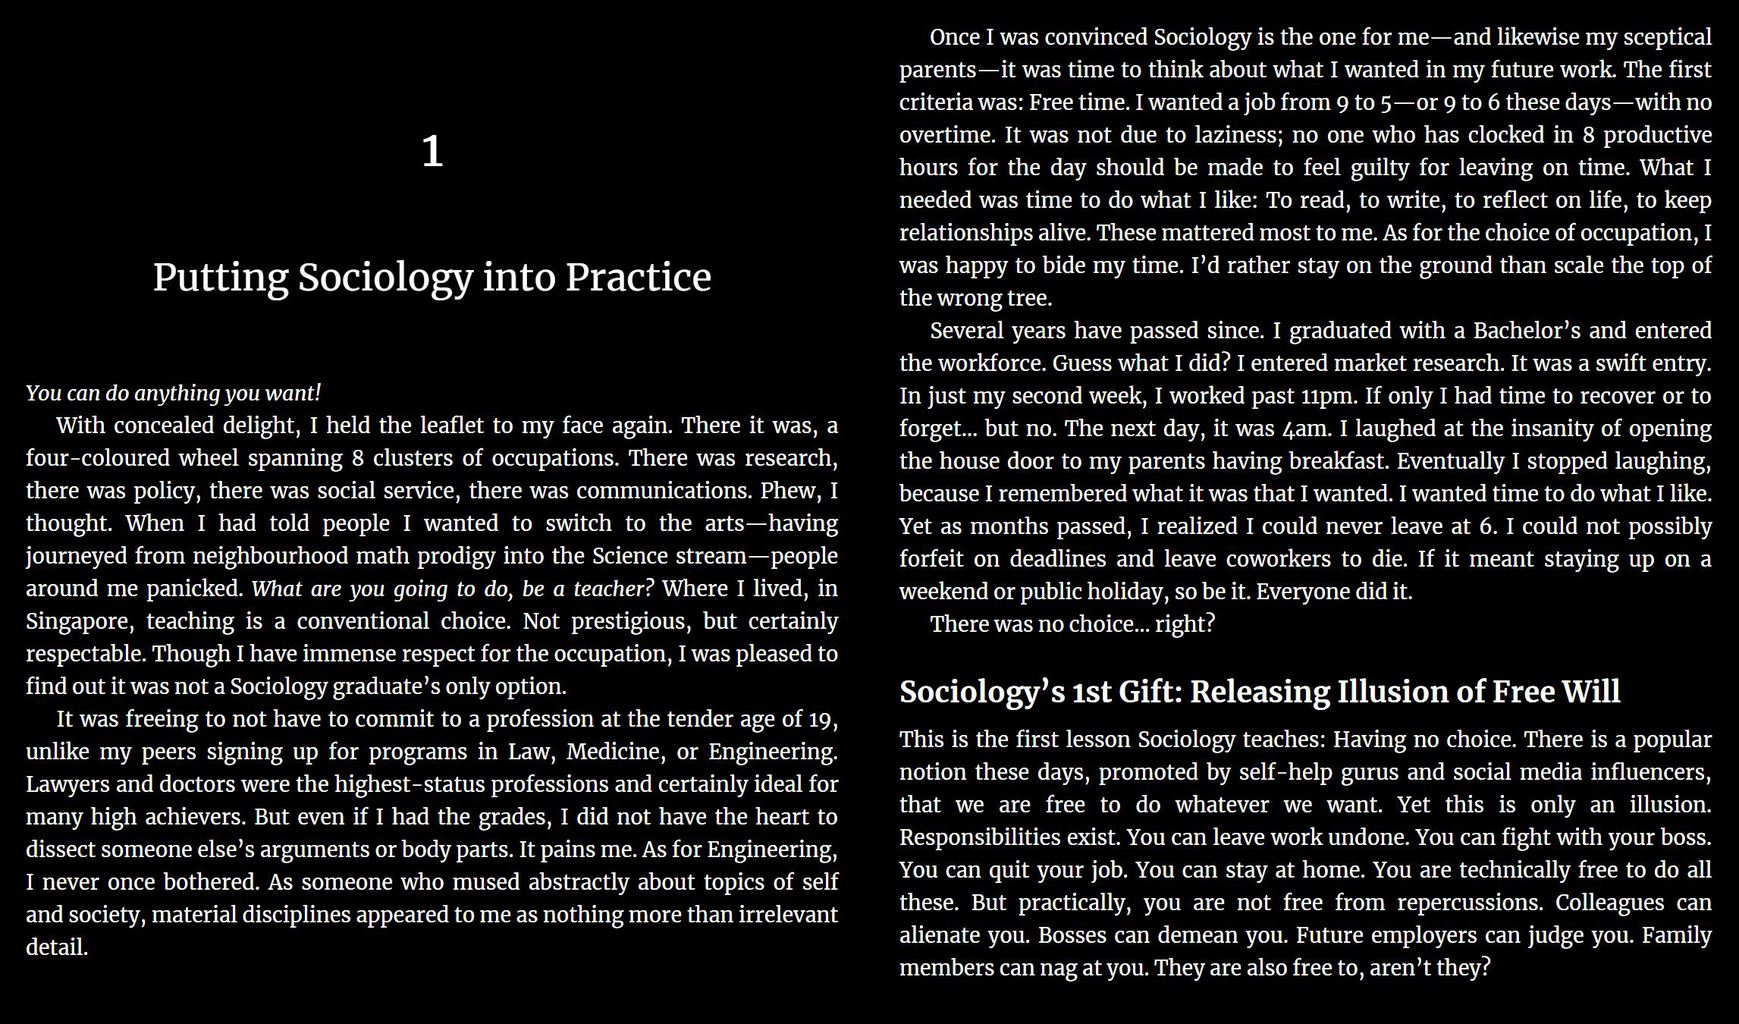 The Sociology Practicum Preview Image 3 (Desktop)